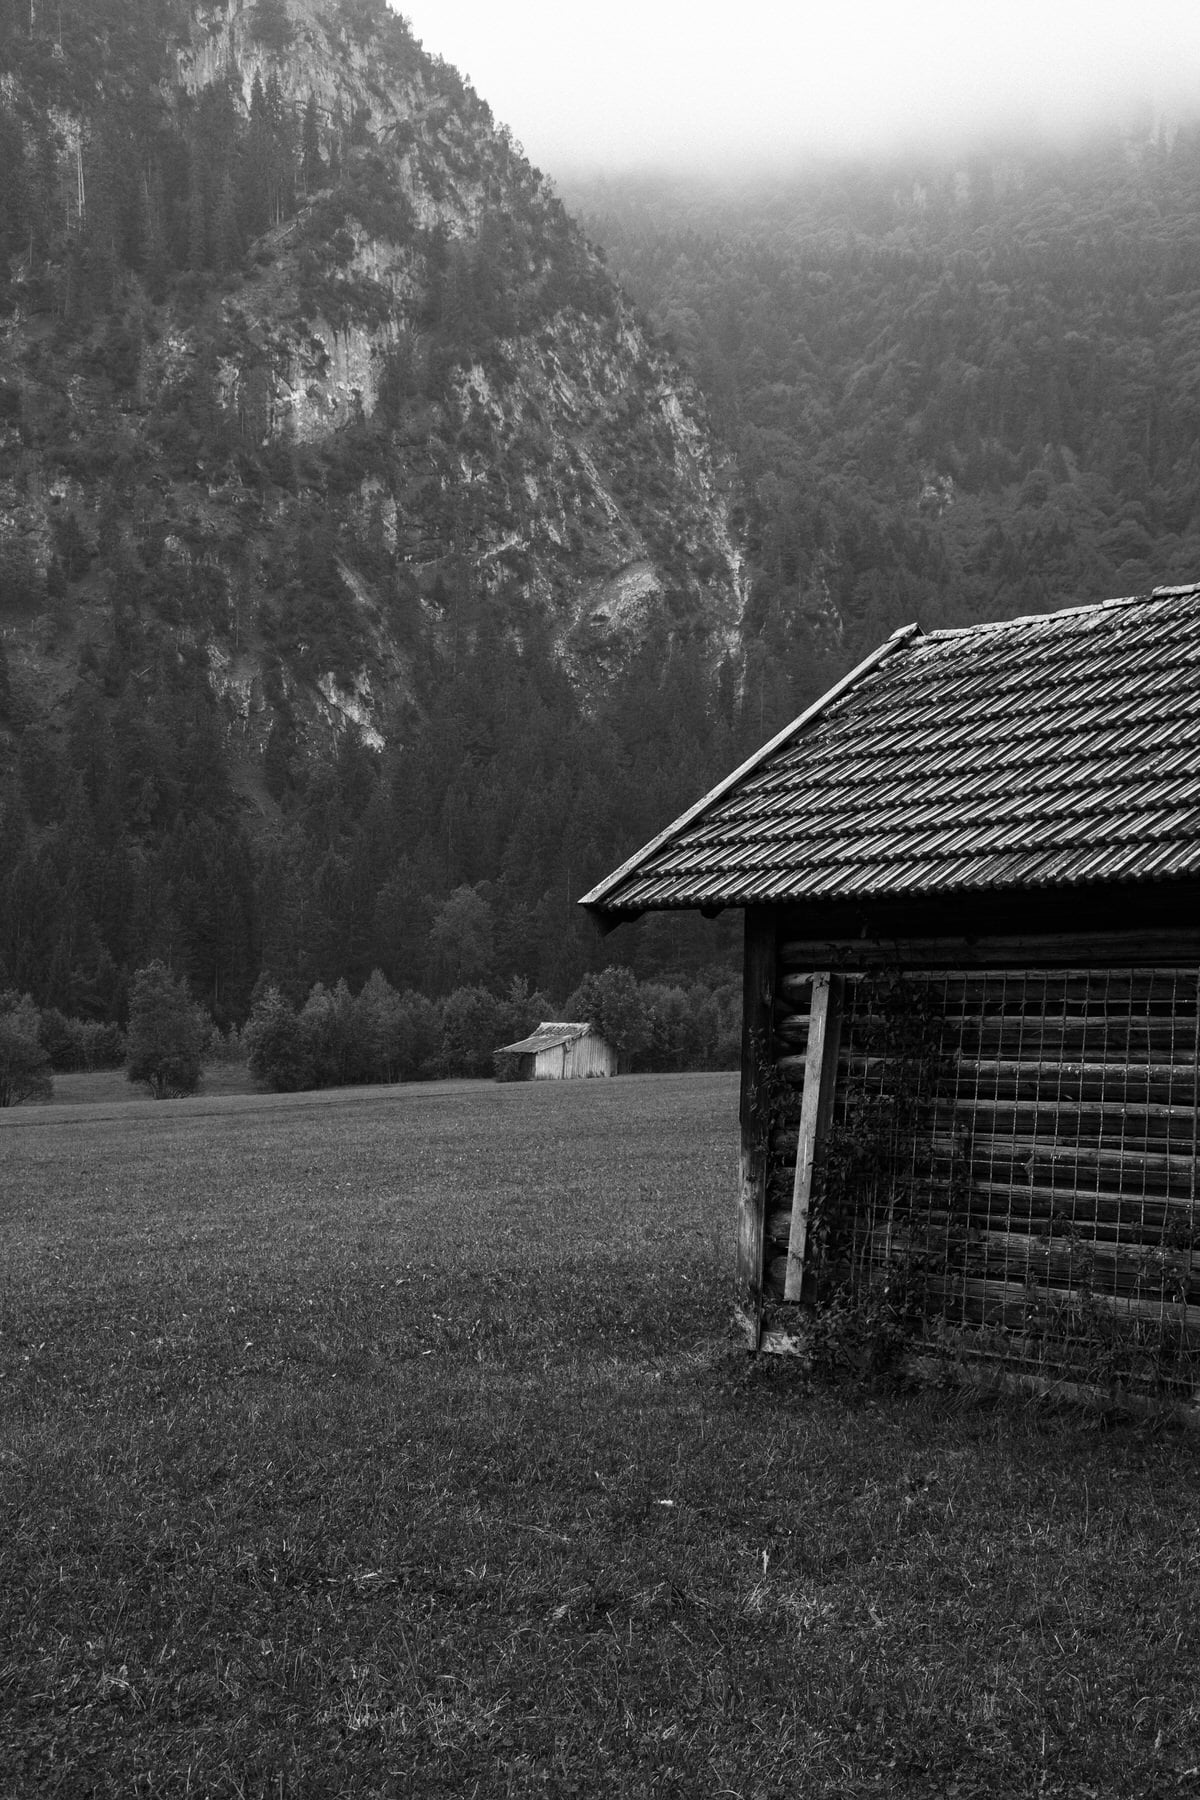 Garmisch_Germany-black-and-white-fine-art-photography-by-Studio-L-photographer-Laura-Schneider-_3630